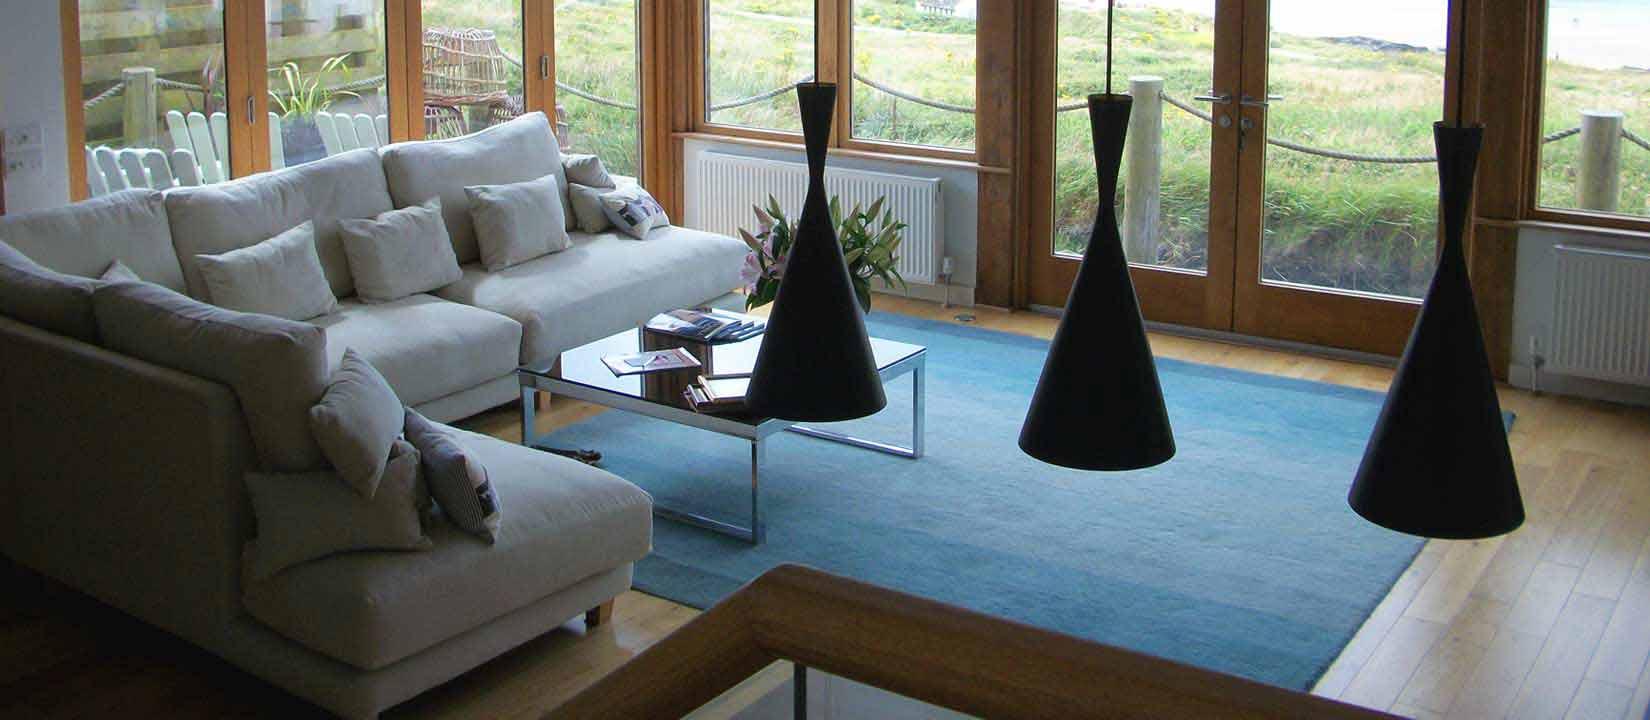 Carpet Shop In Northampton Flooring Across Northamptonshire